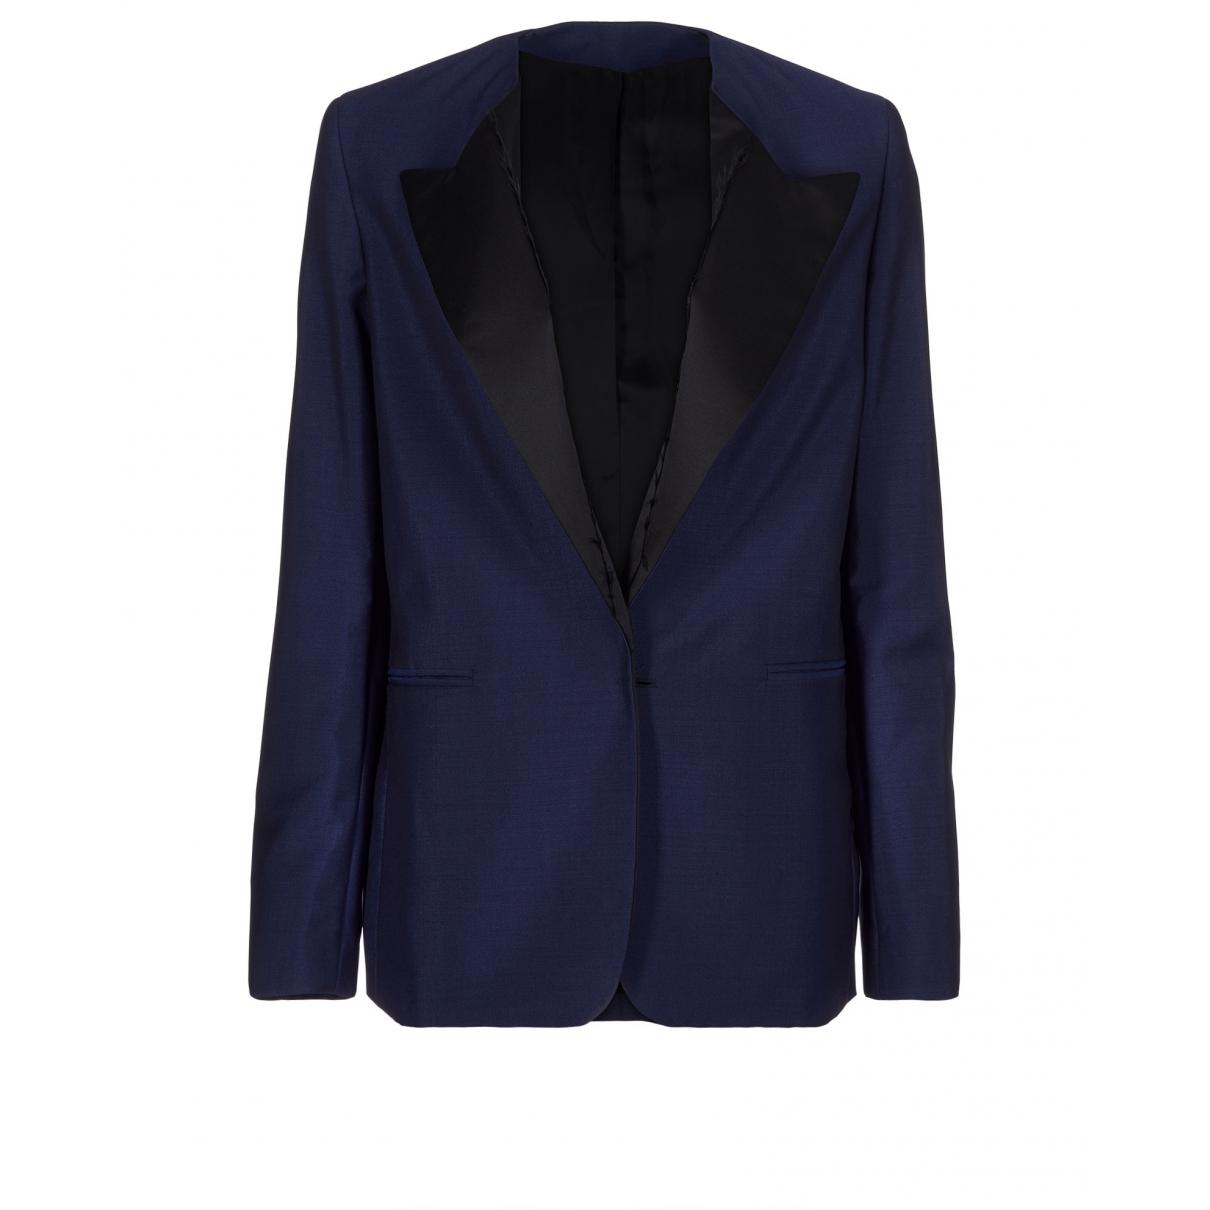 Acne Studios N Blue Wool jacket for Women 10 UK